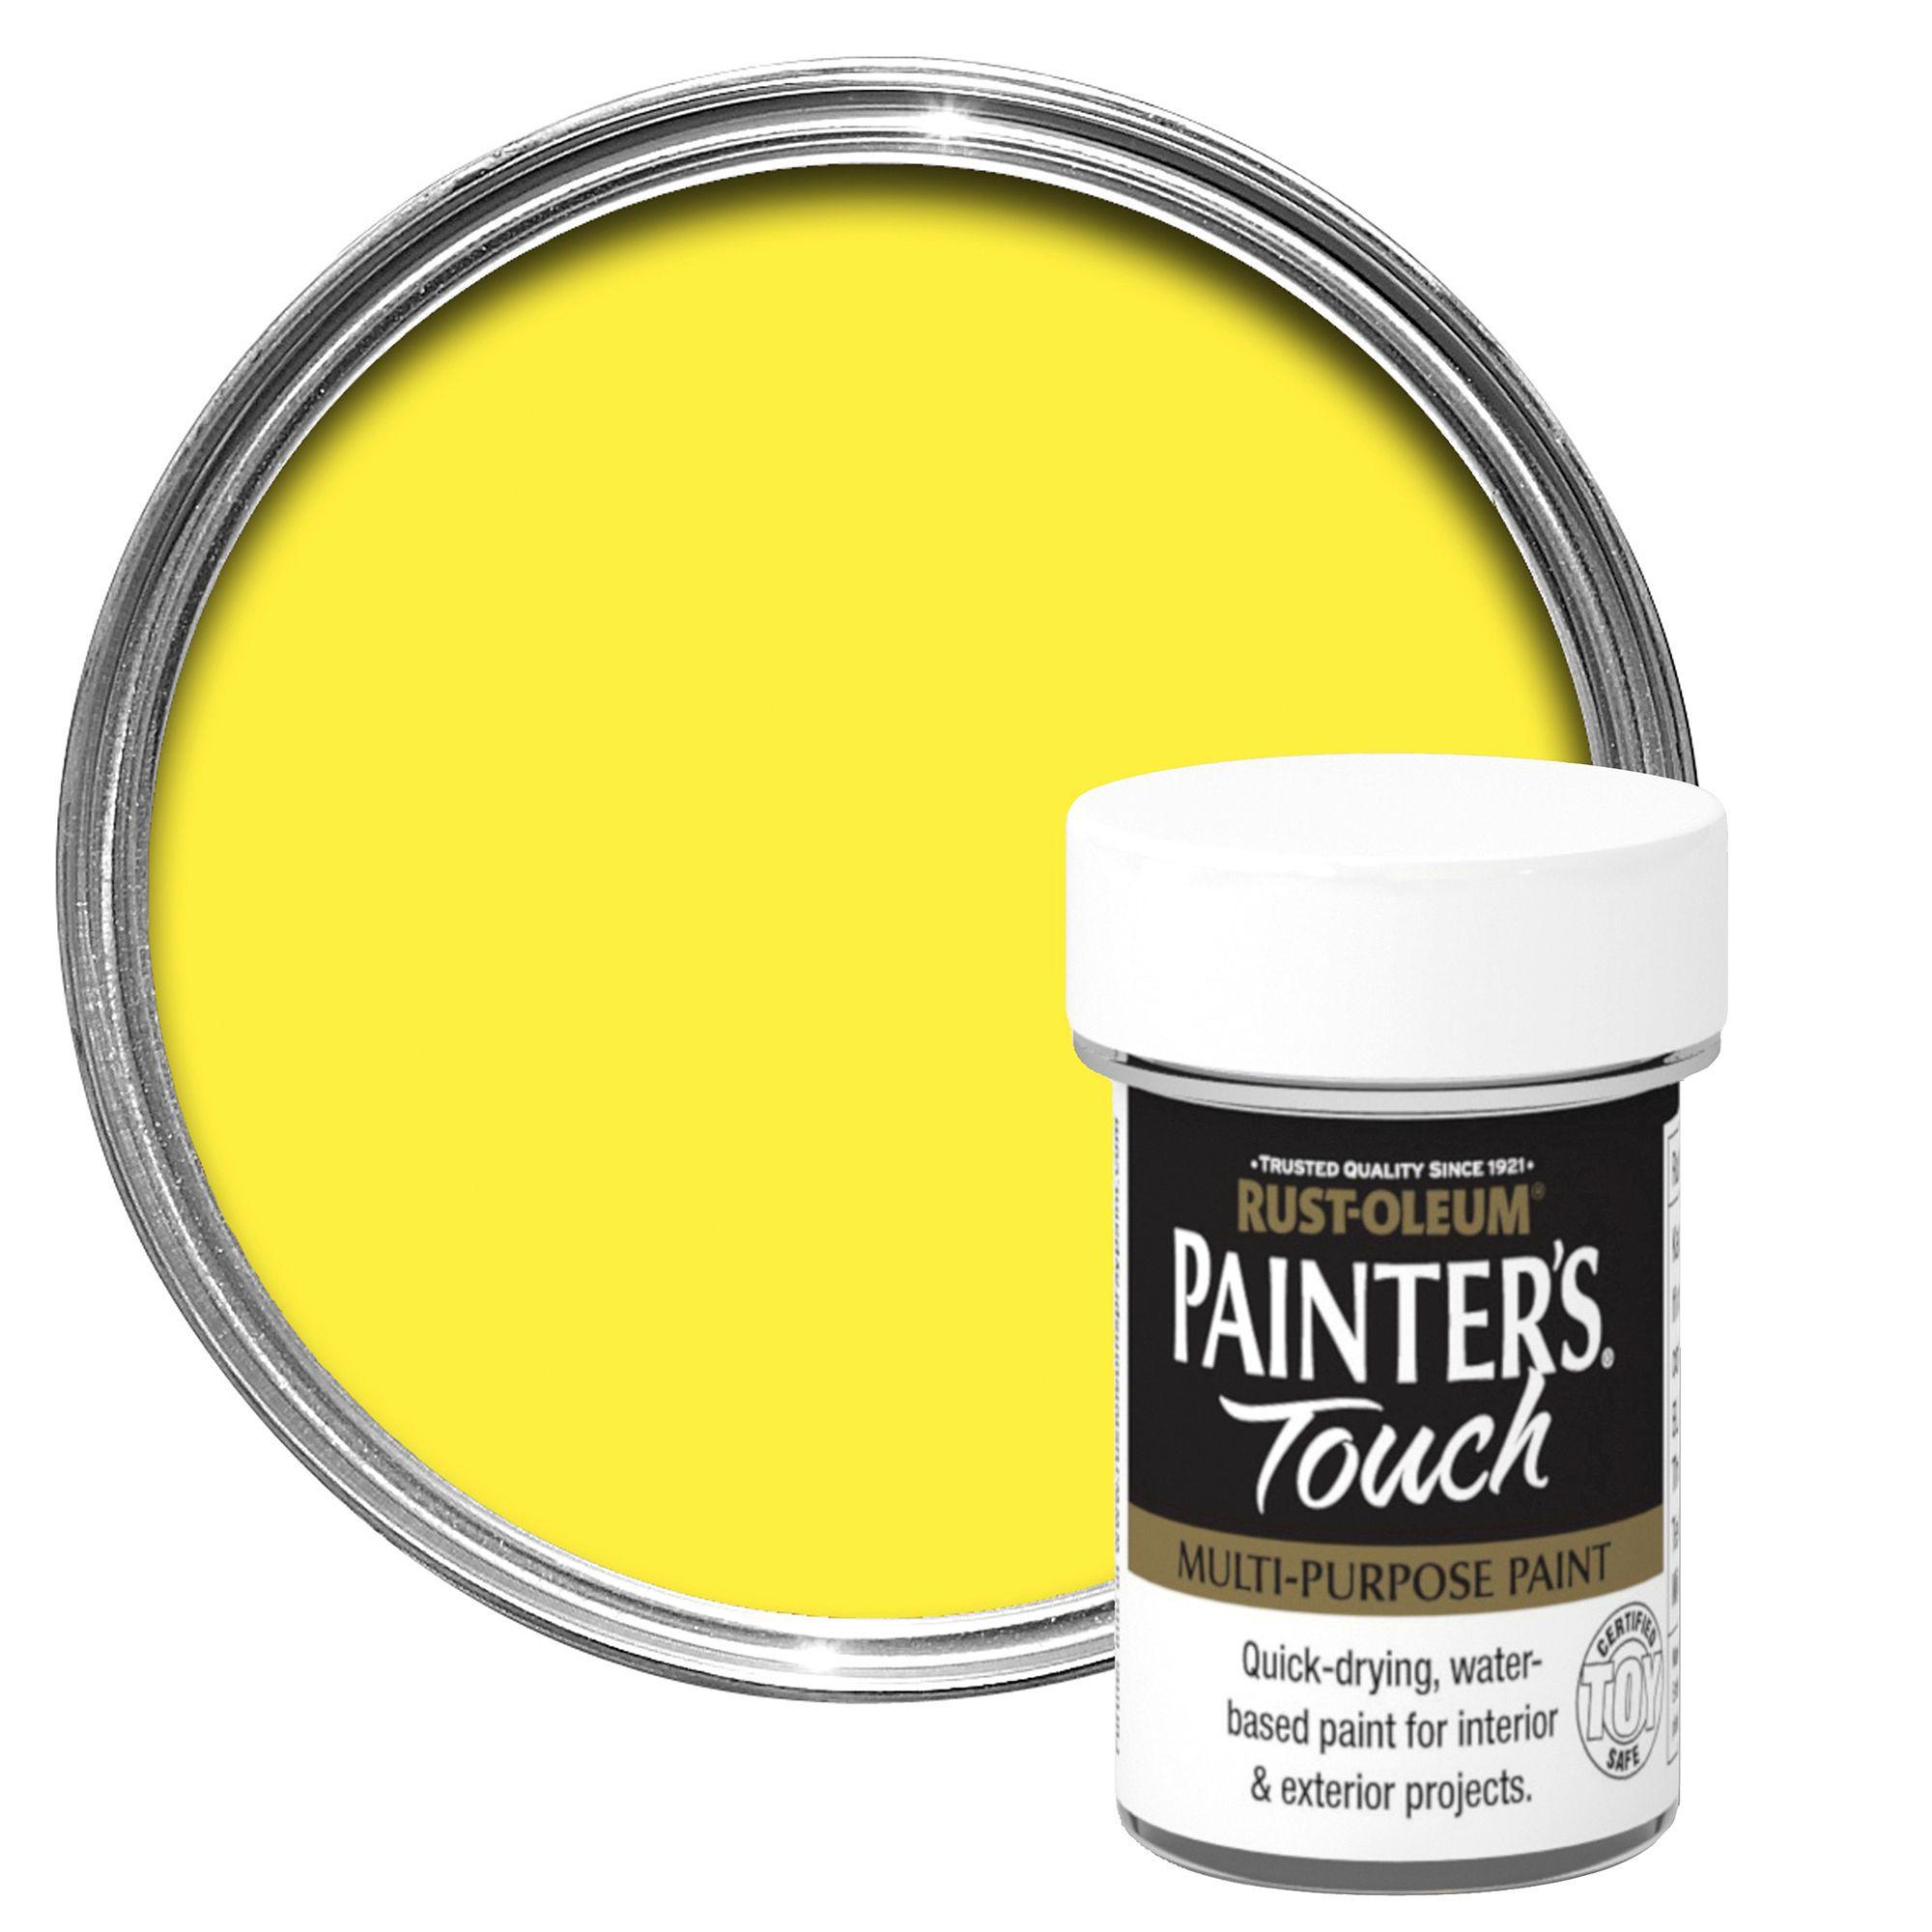 Rust-oleum Painter's Touch Interior & Exterior Bright Yellow Gloss Multipurpose Paint 20ml